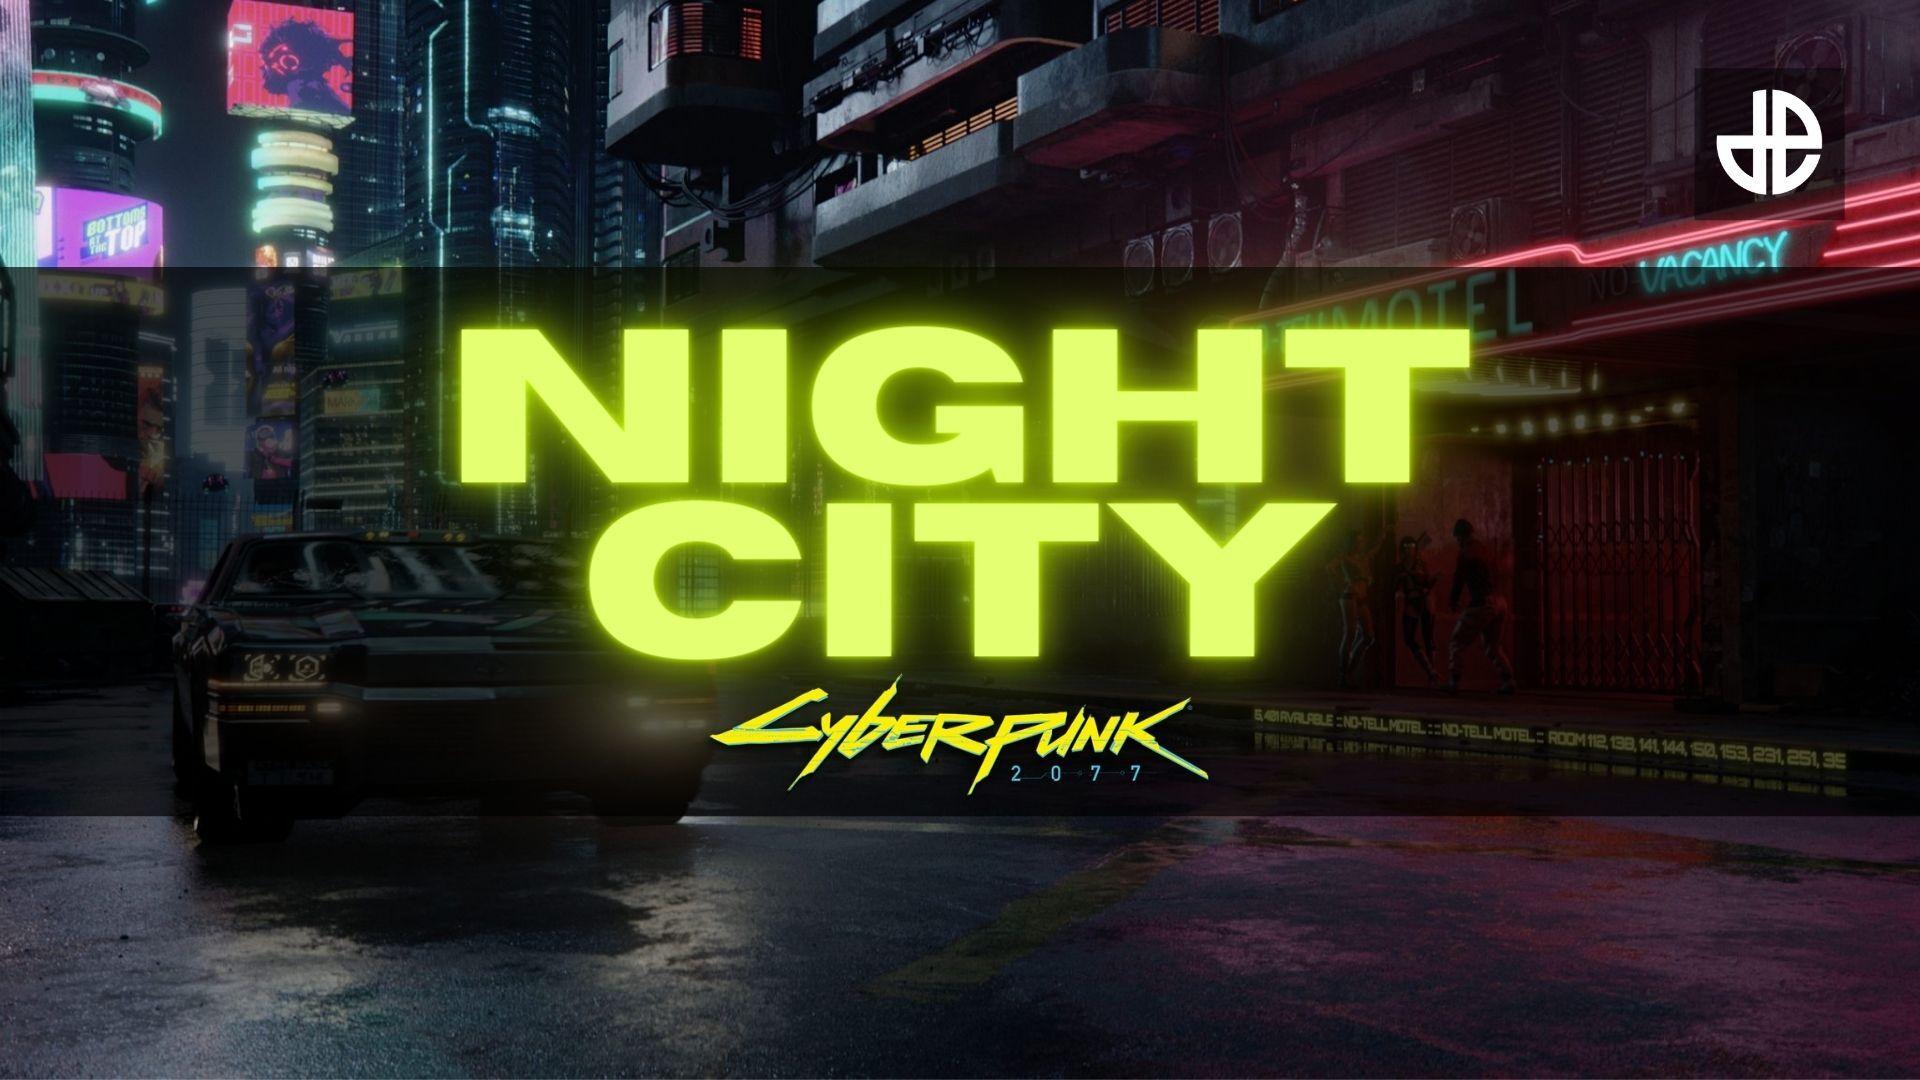 A screenshot of Cyberpunk 2077 Night City with text